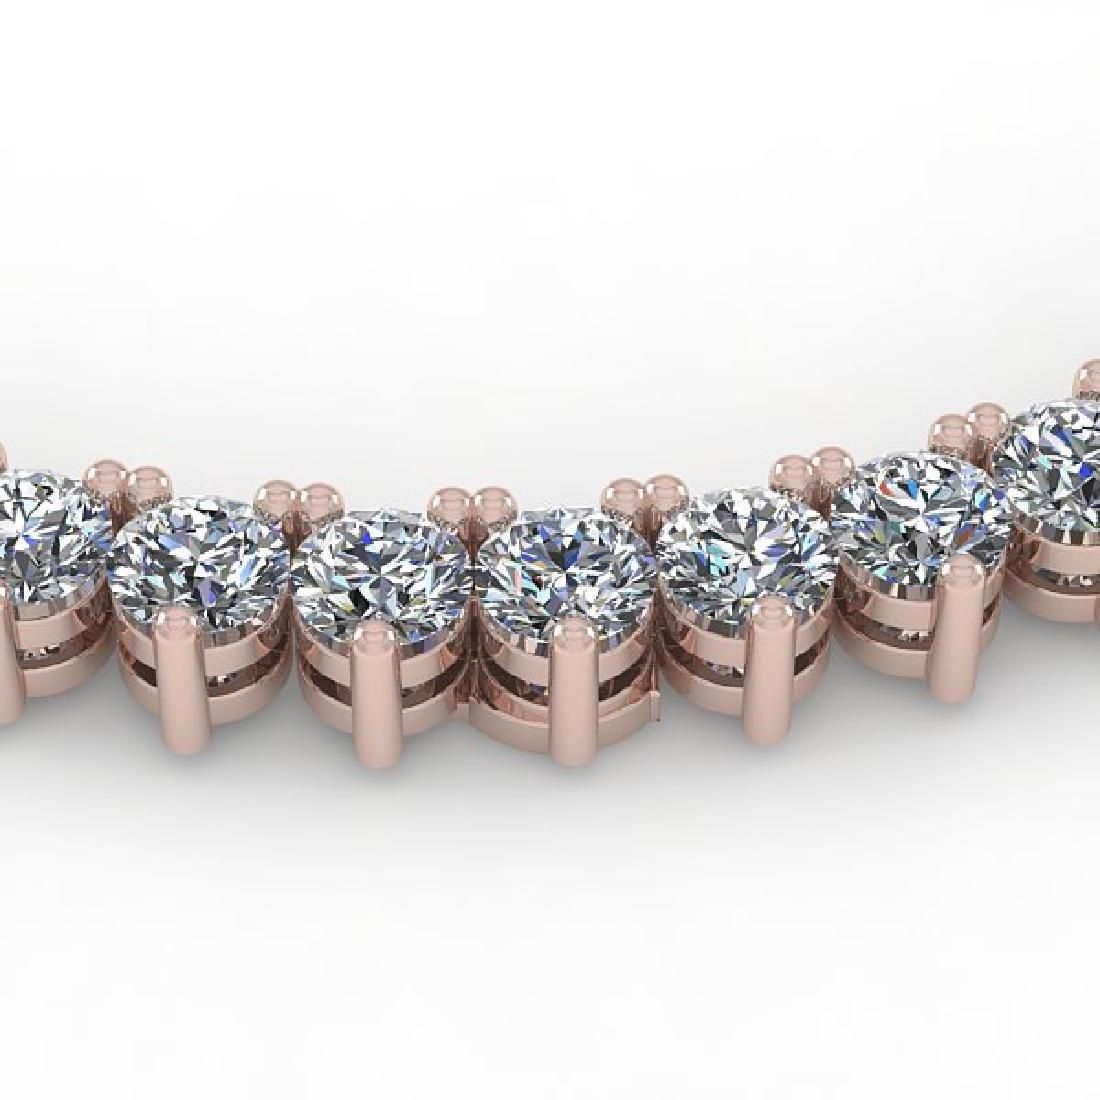 10 CTW Solitaire VS/SI Diamond Necklace 14K Gold